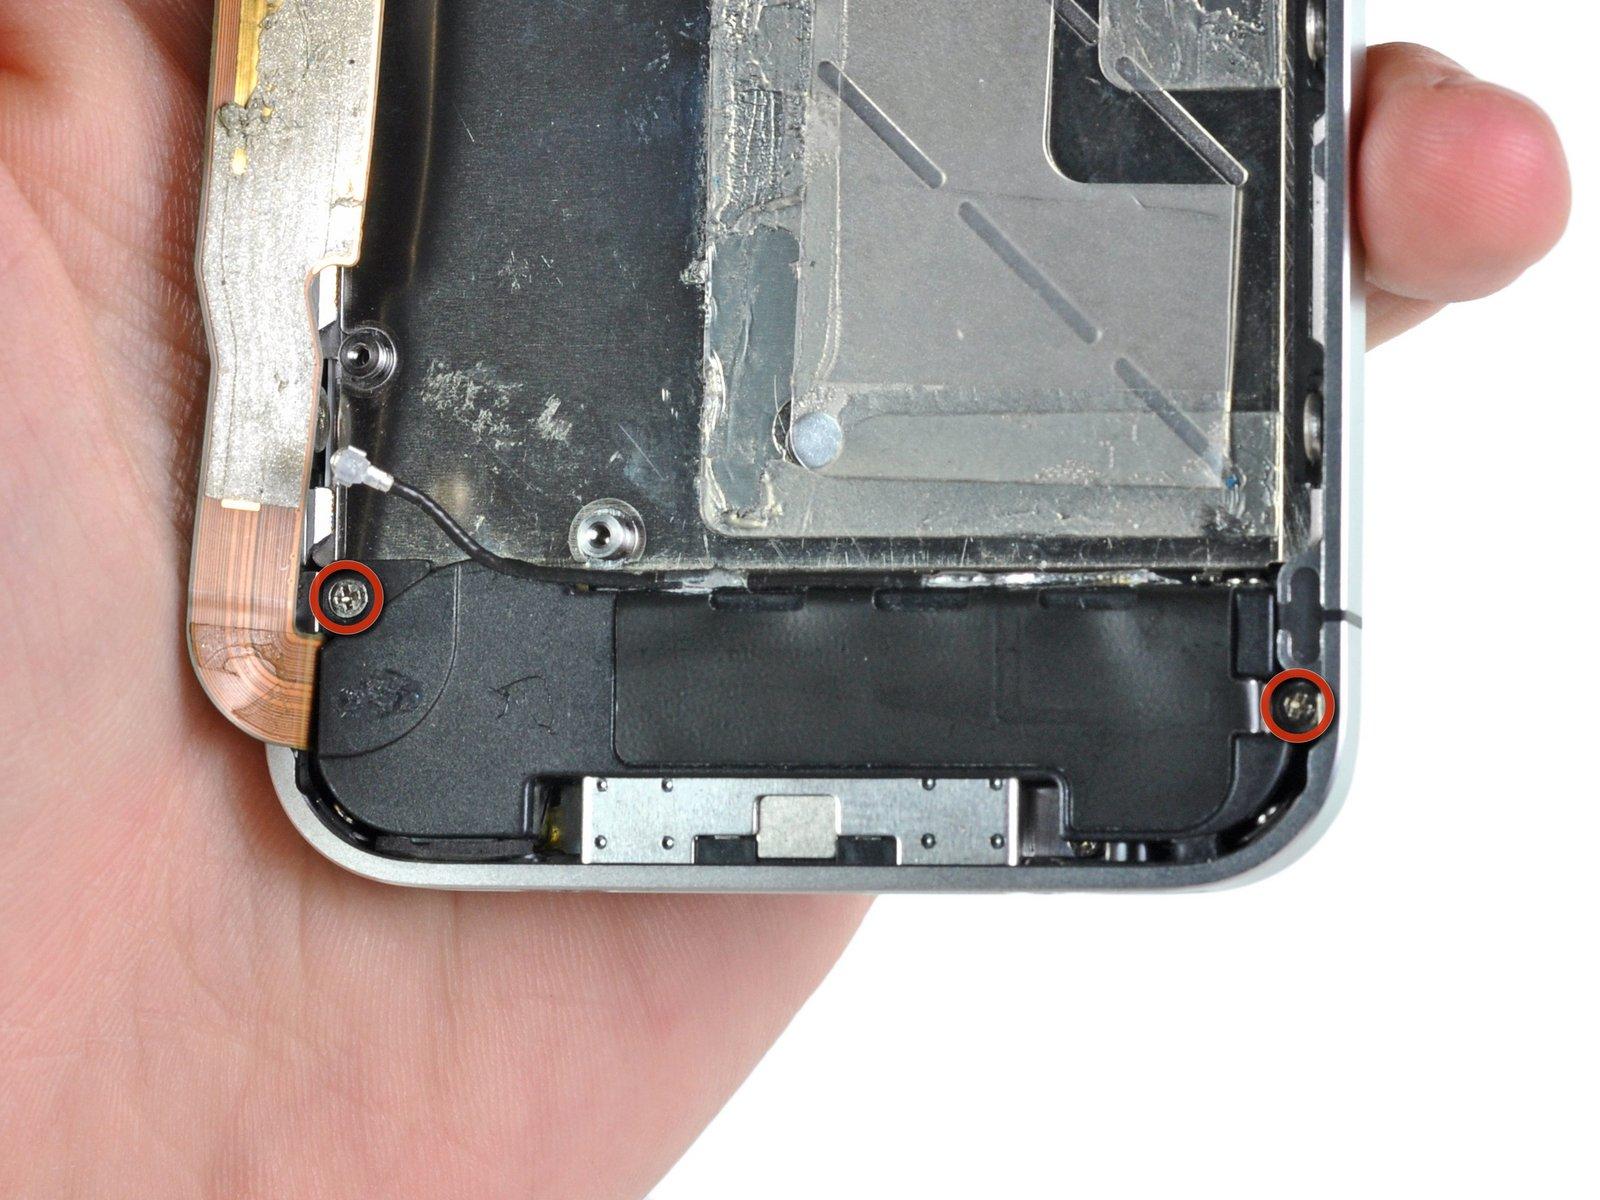 Замена дисплея iphone 4 своими руками видео